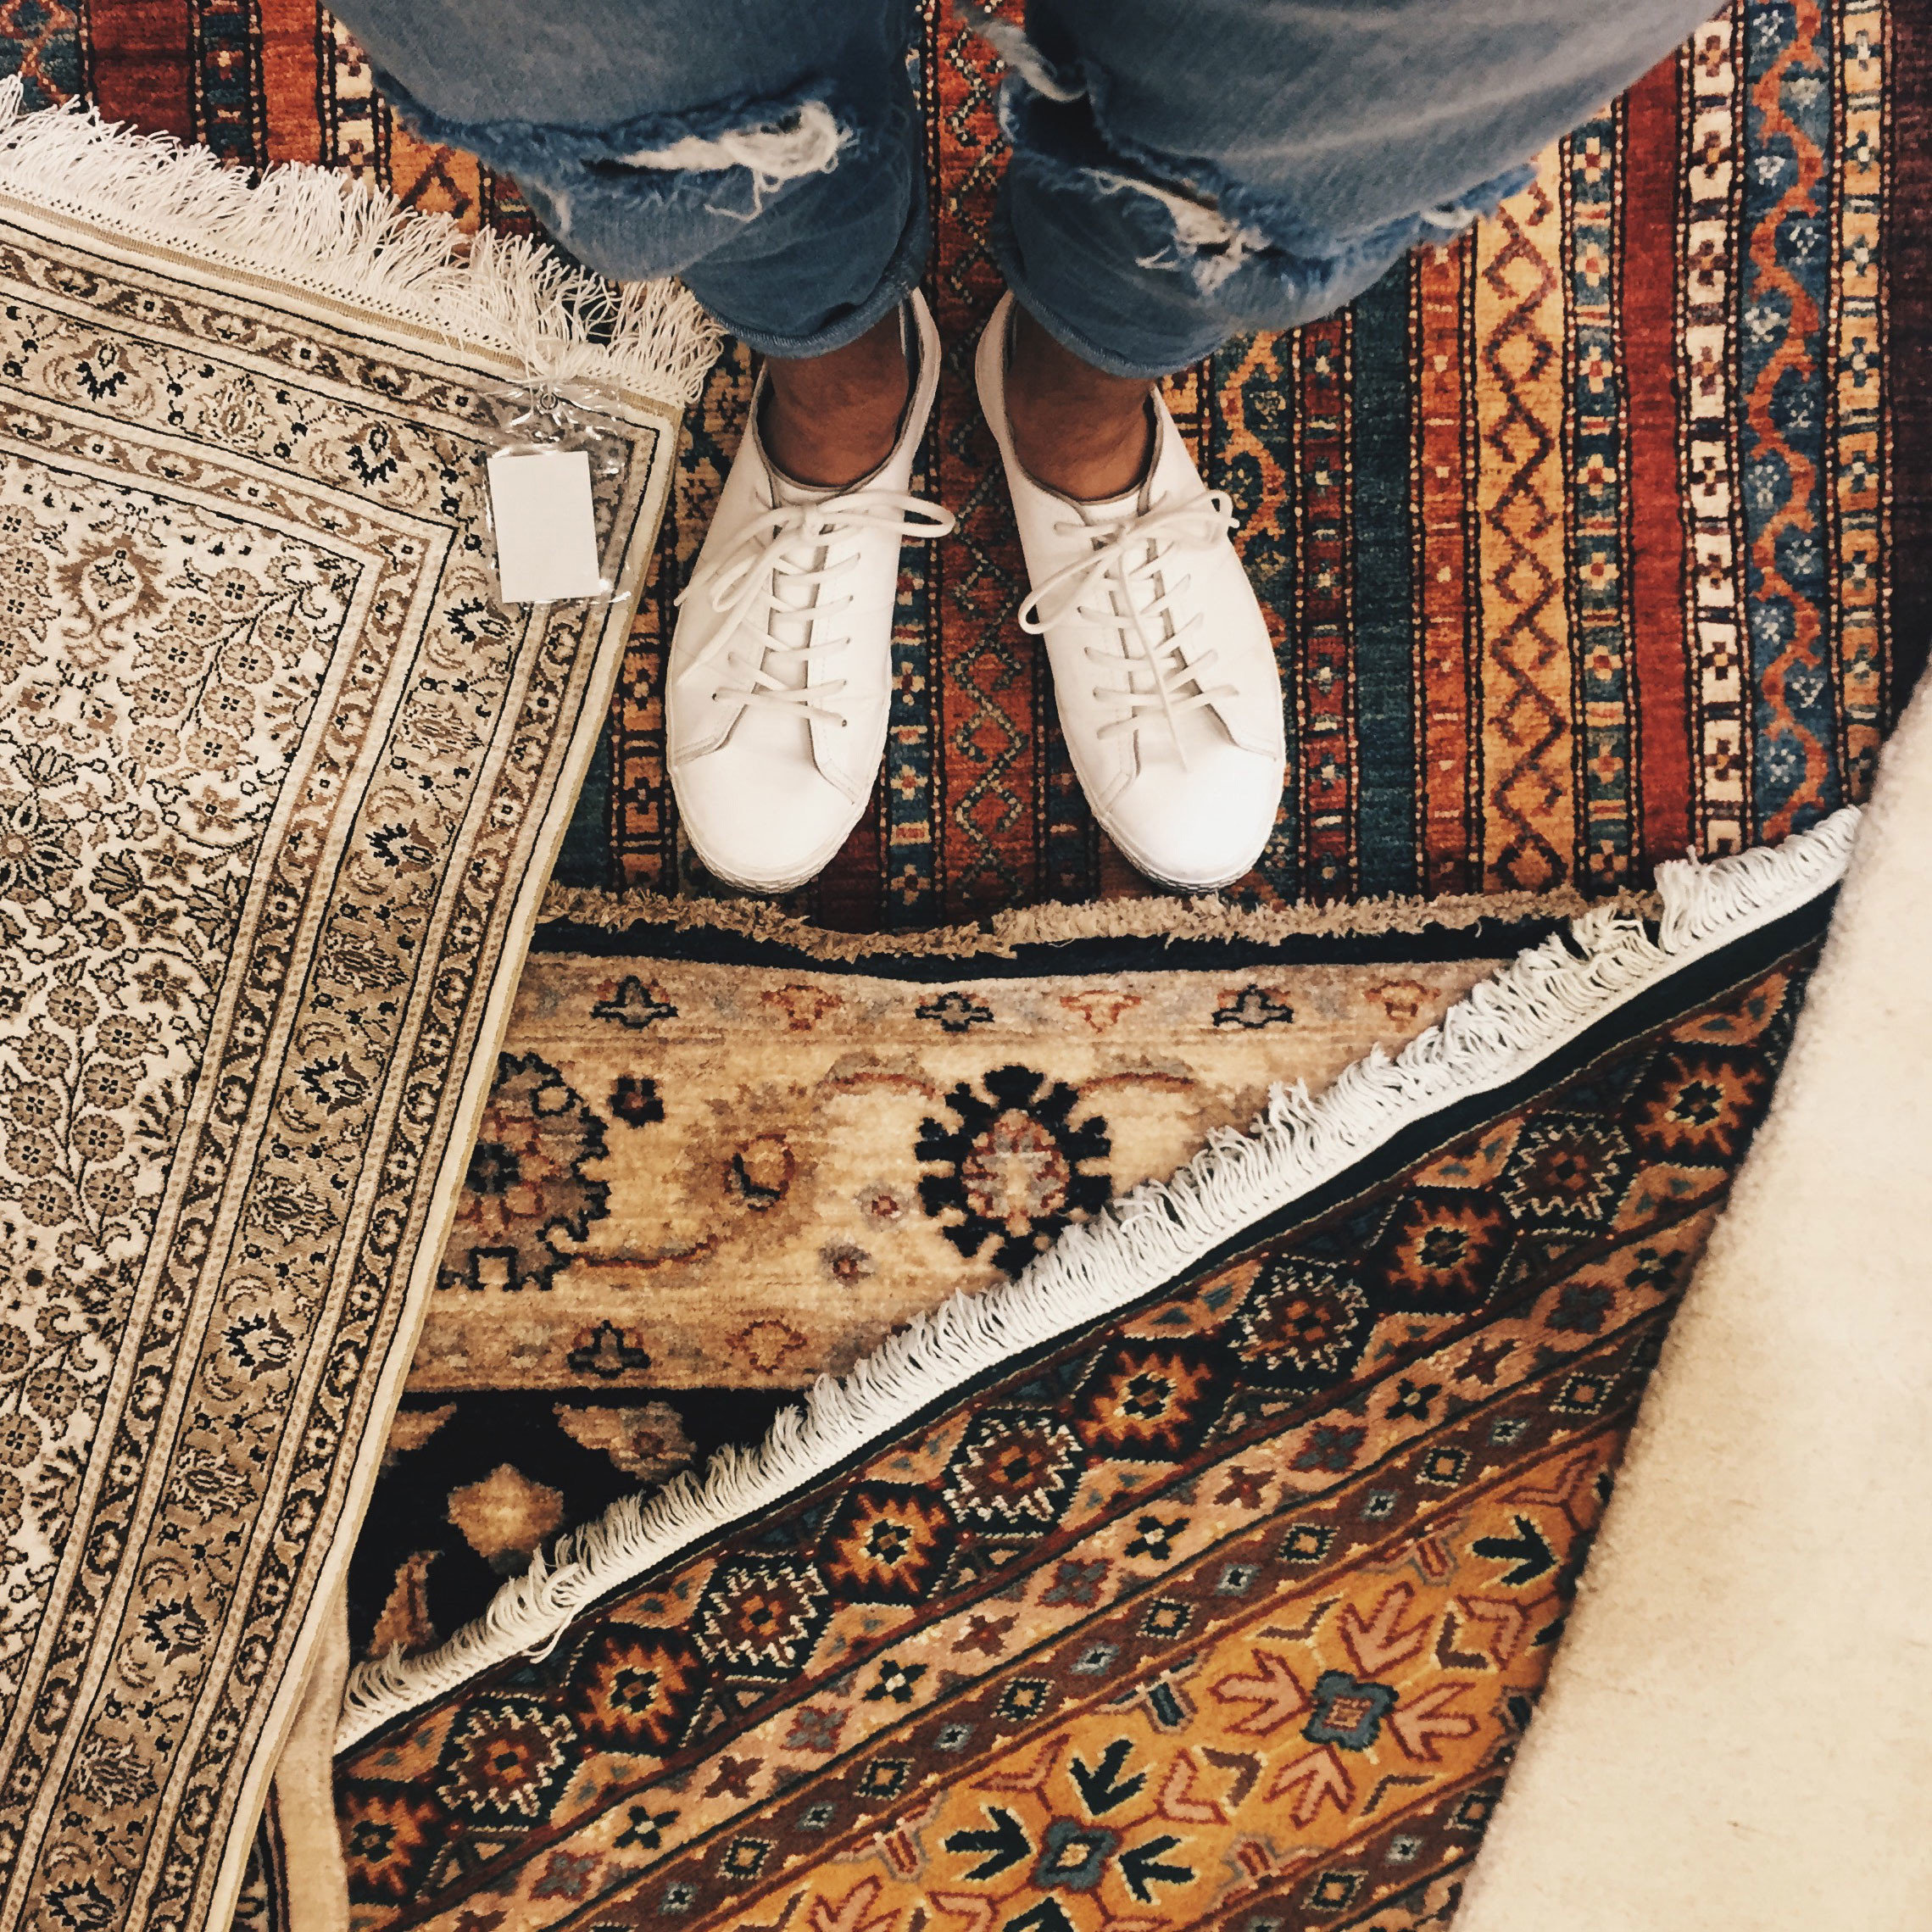 Style + Design floor indoor art footwear flooring pattern spring Design shoe textile rug